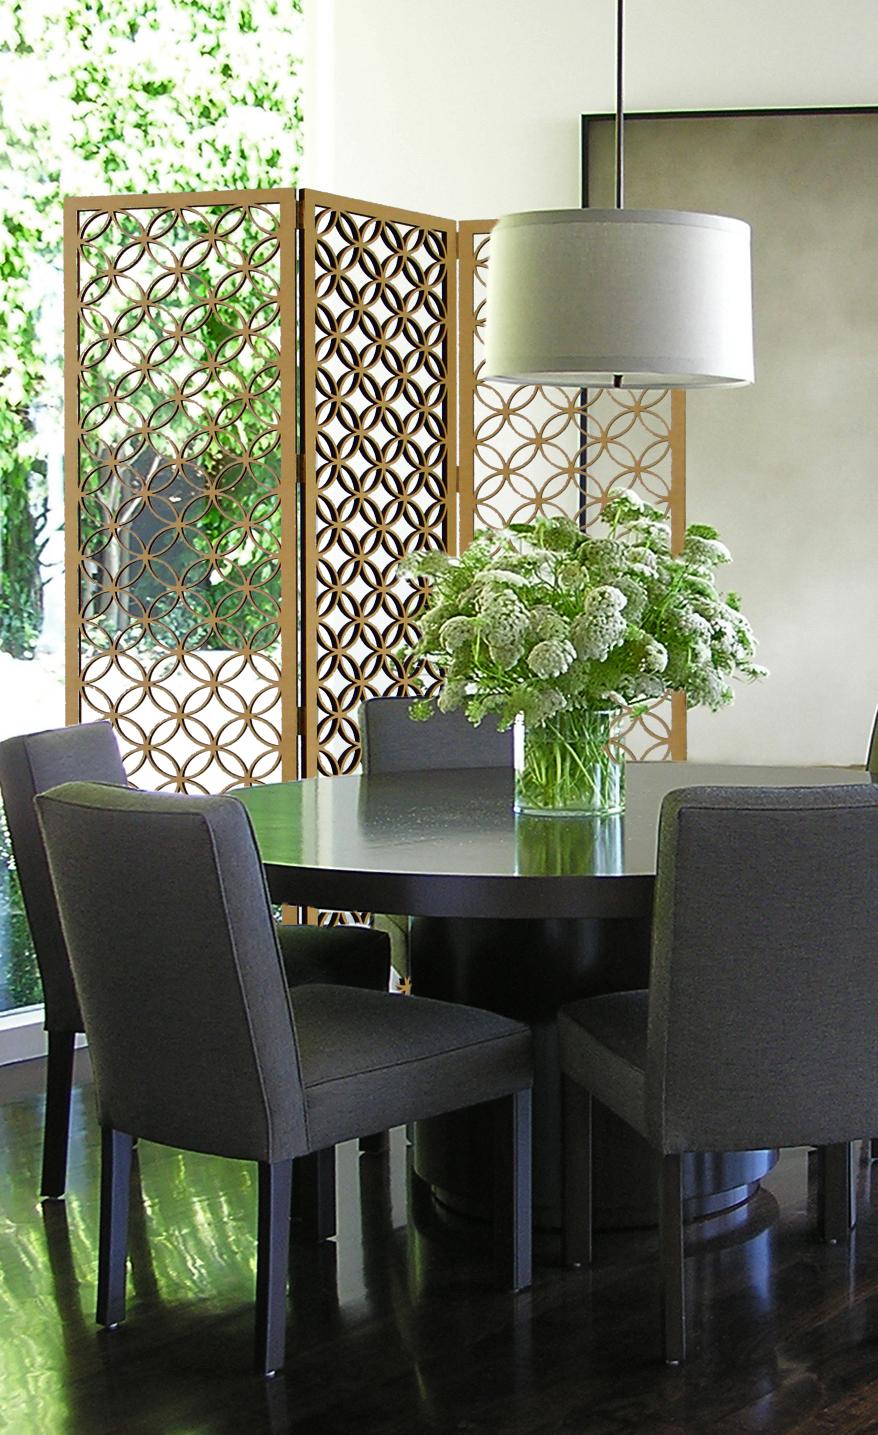 Better Homes and Gardens_Swift-Grille-flscn-install-unfin.jpg